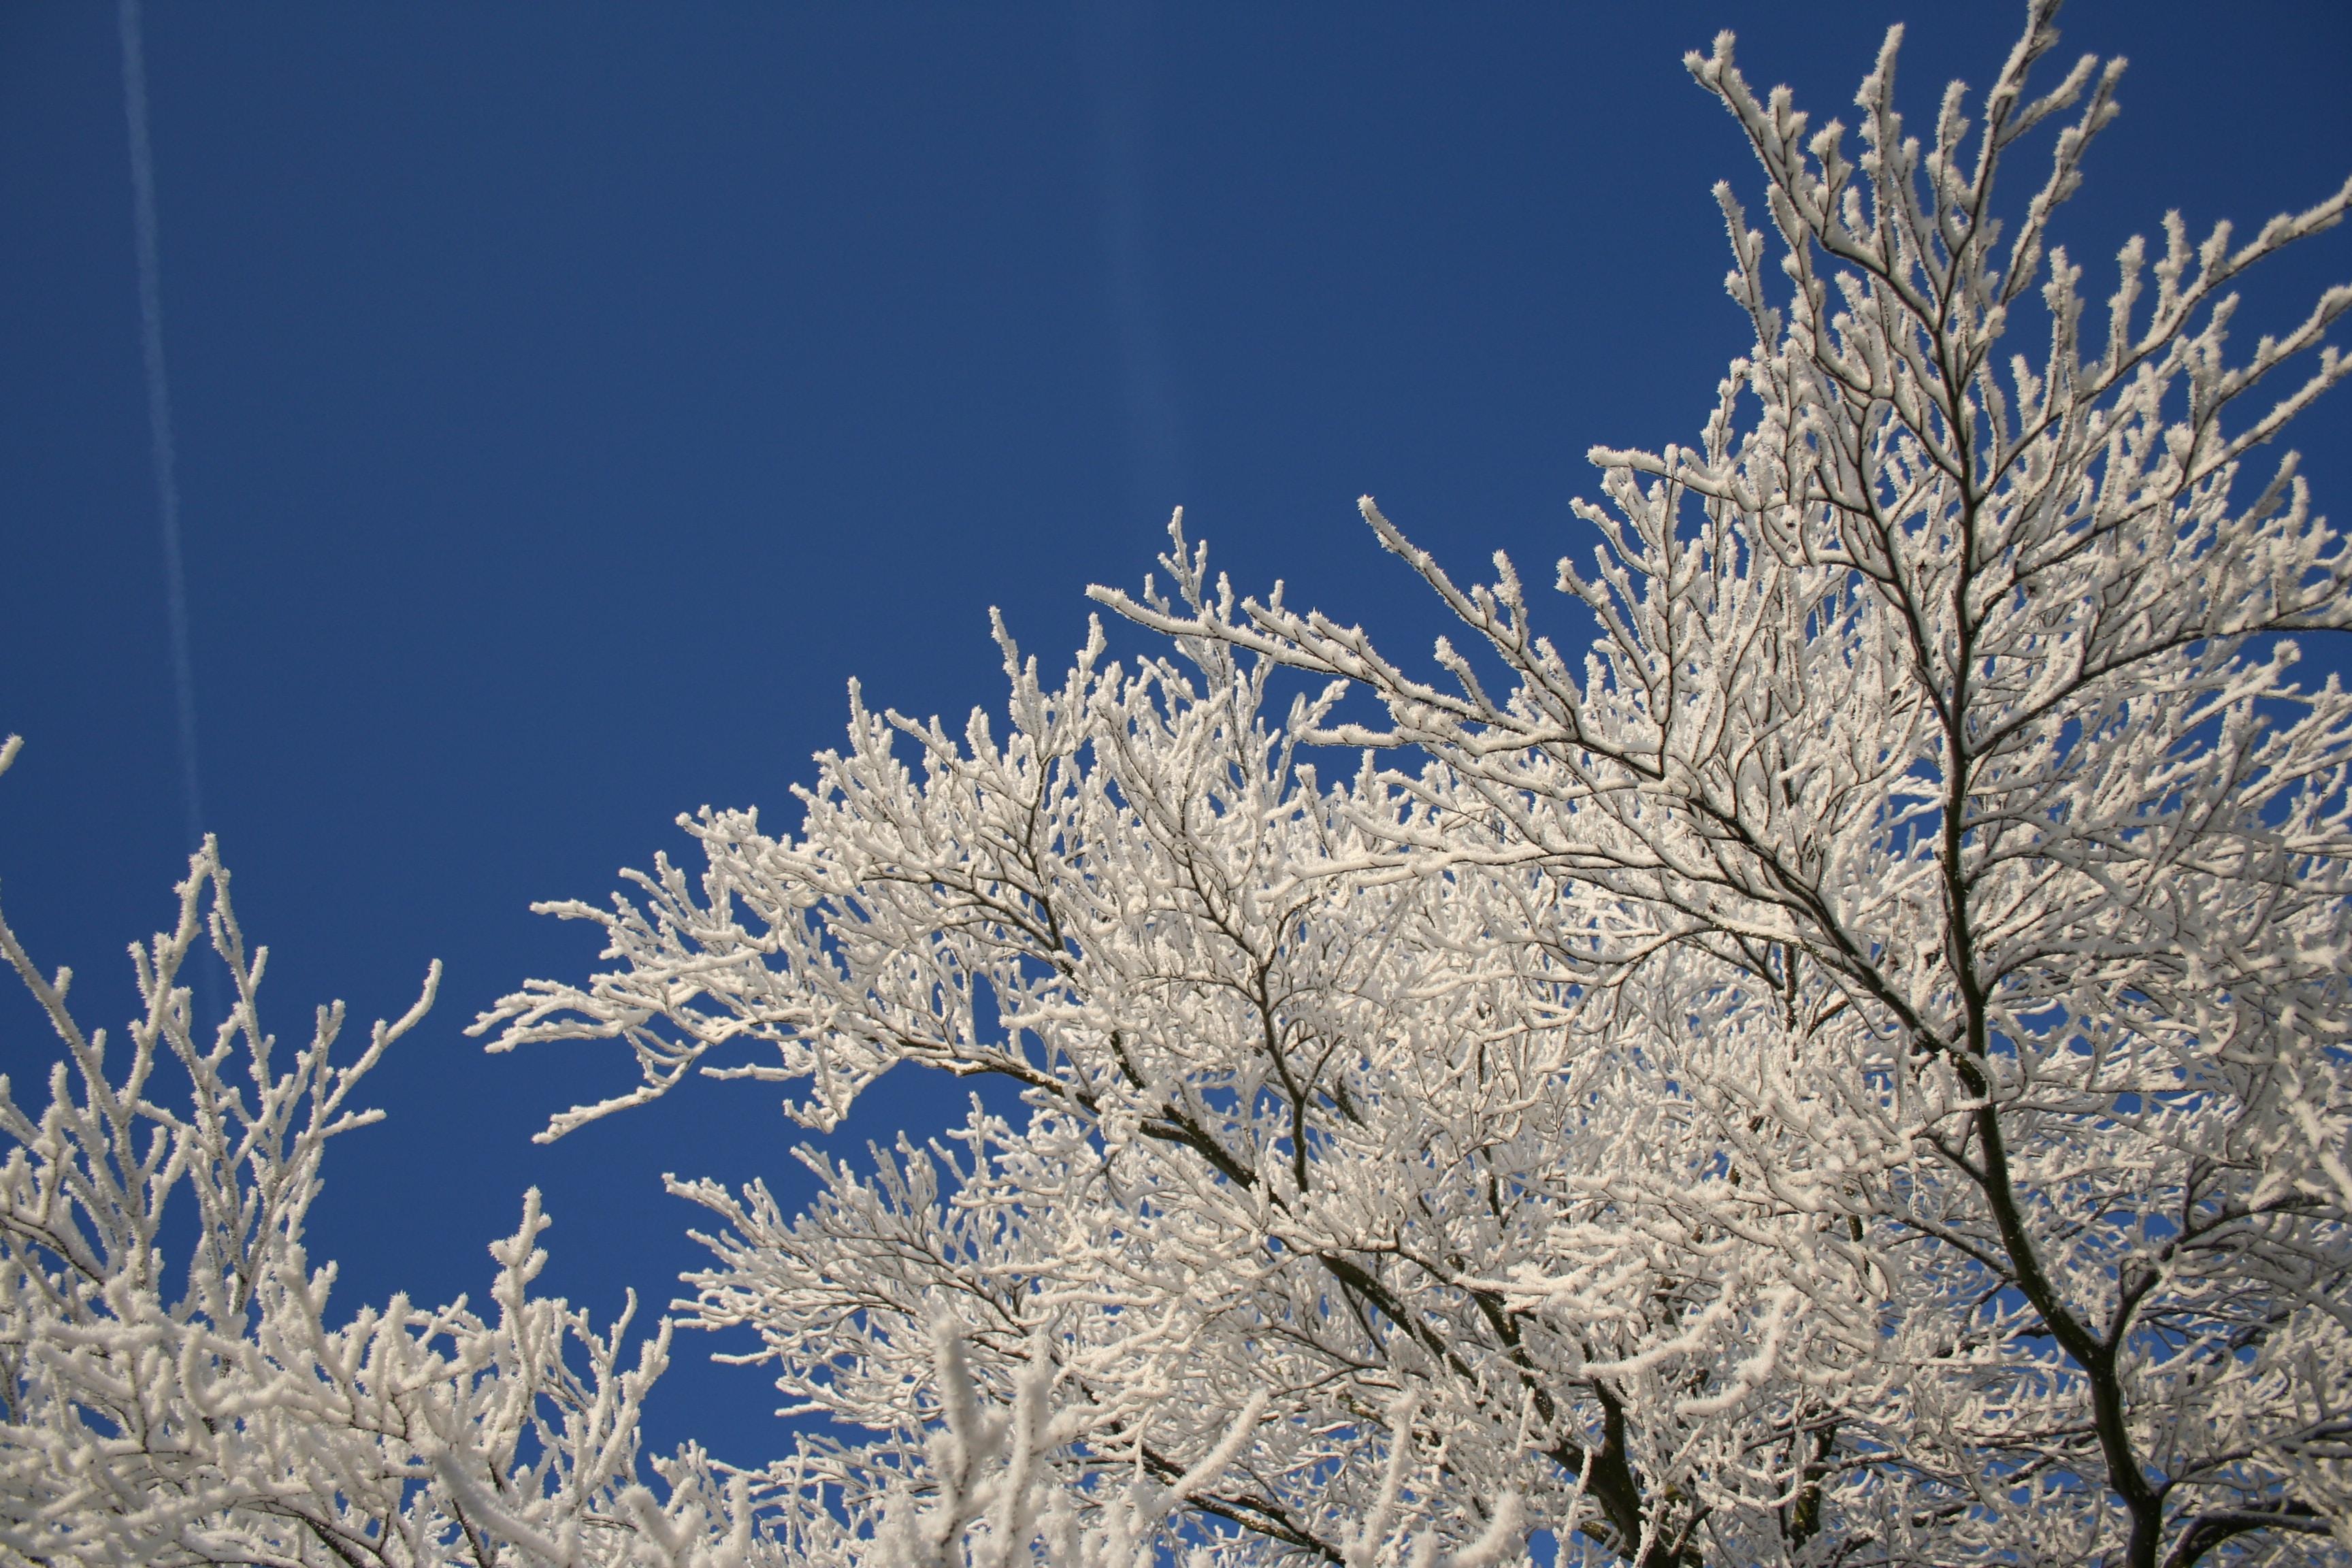 photo of bare tree